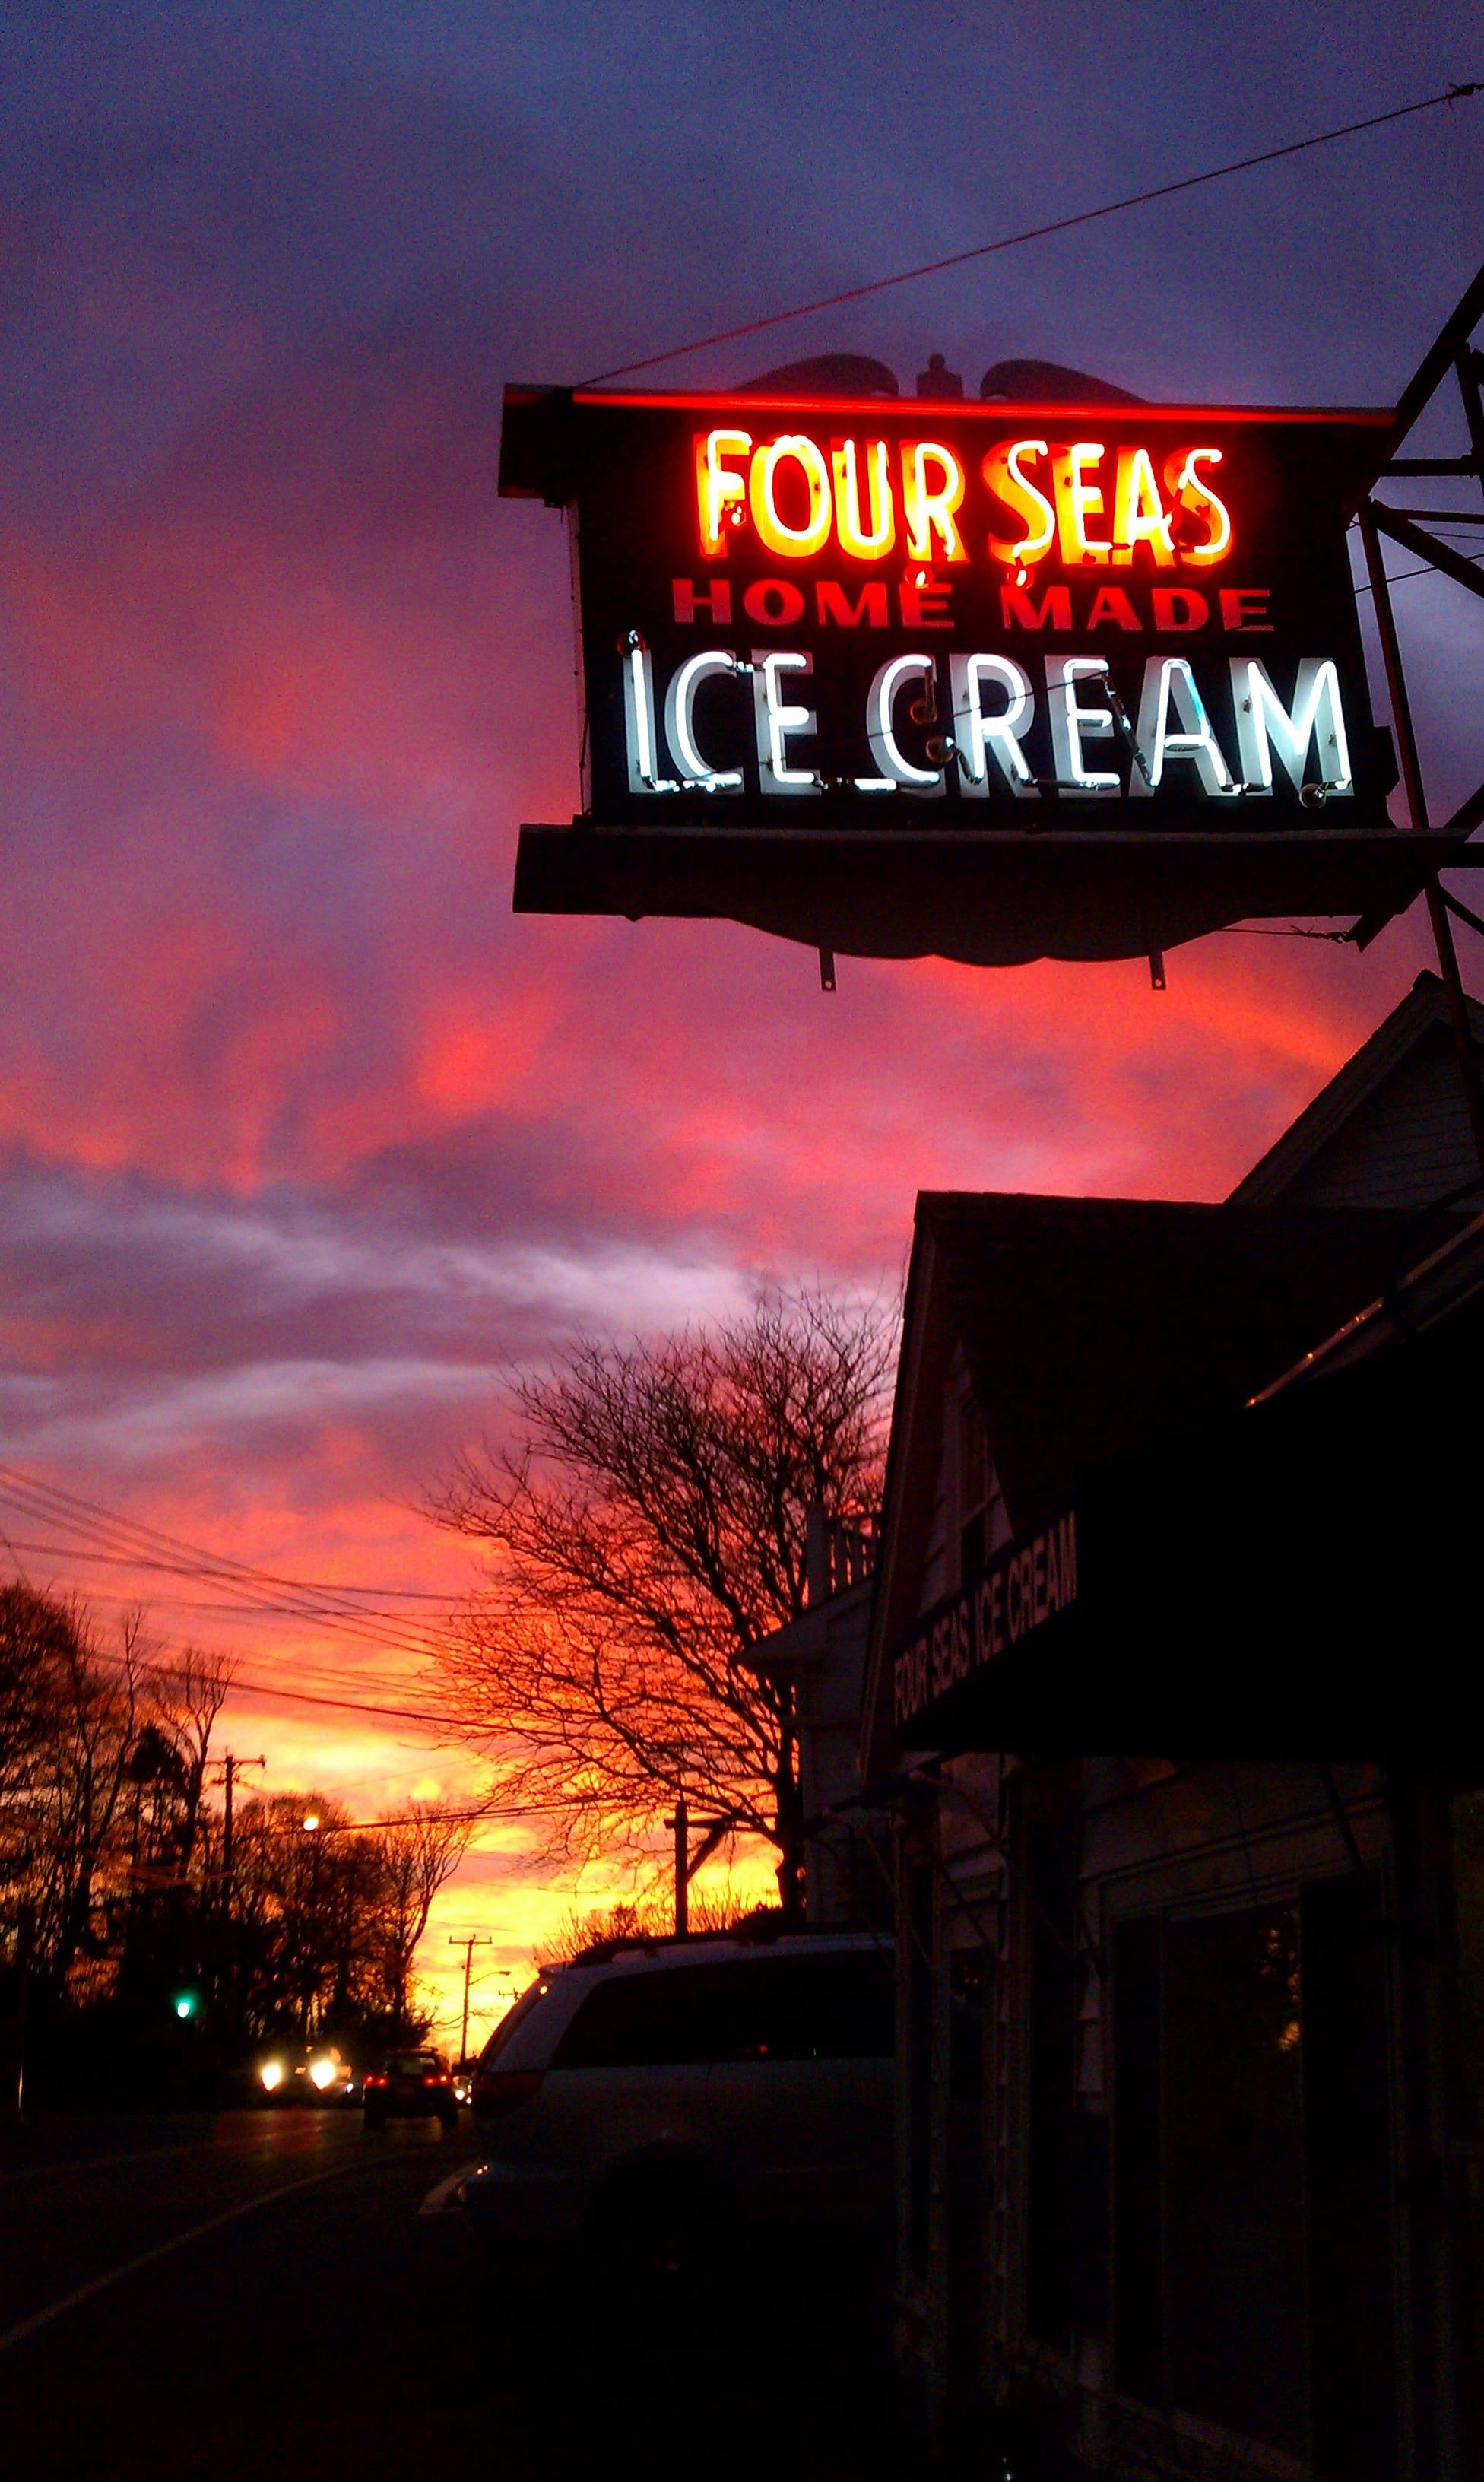 Four Seas Ice Cream - Sunset  at Four Seas Ice Cream